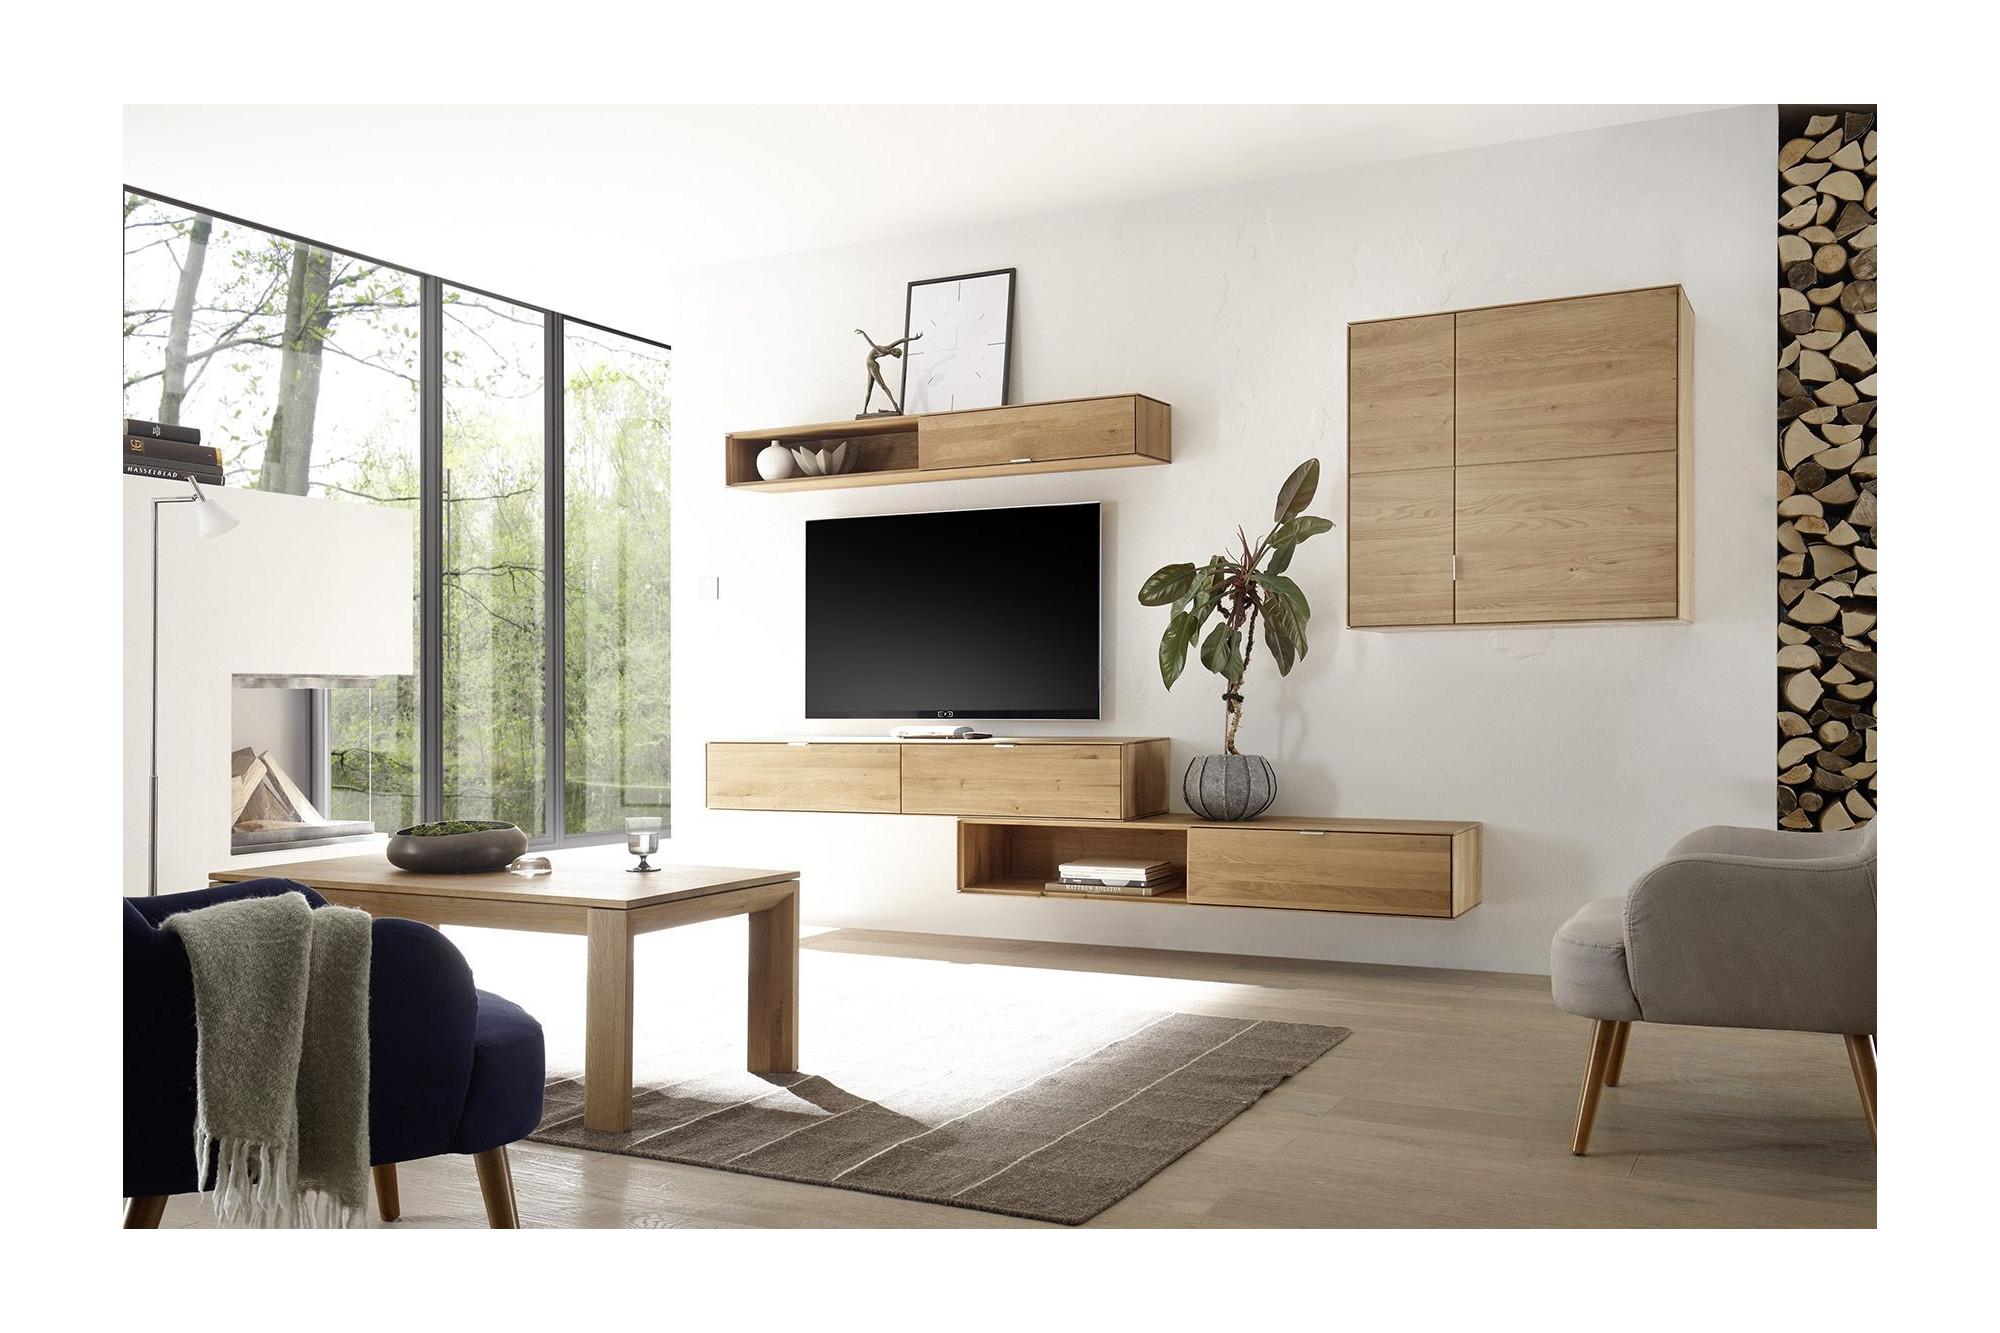 Meuble tv suspendu bois naturel